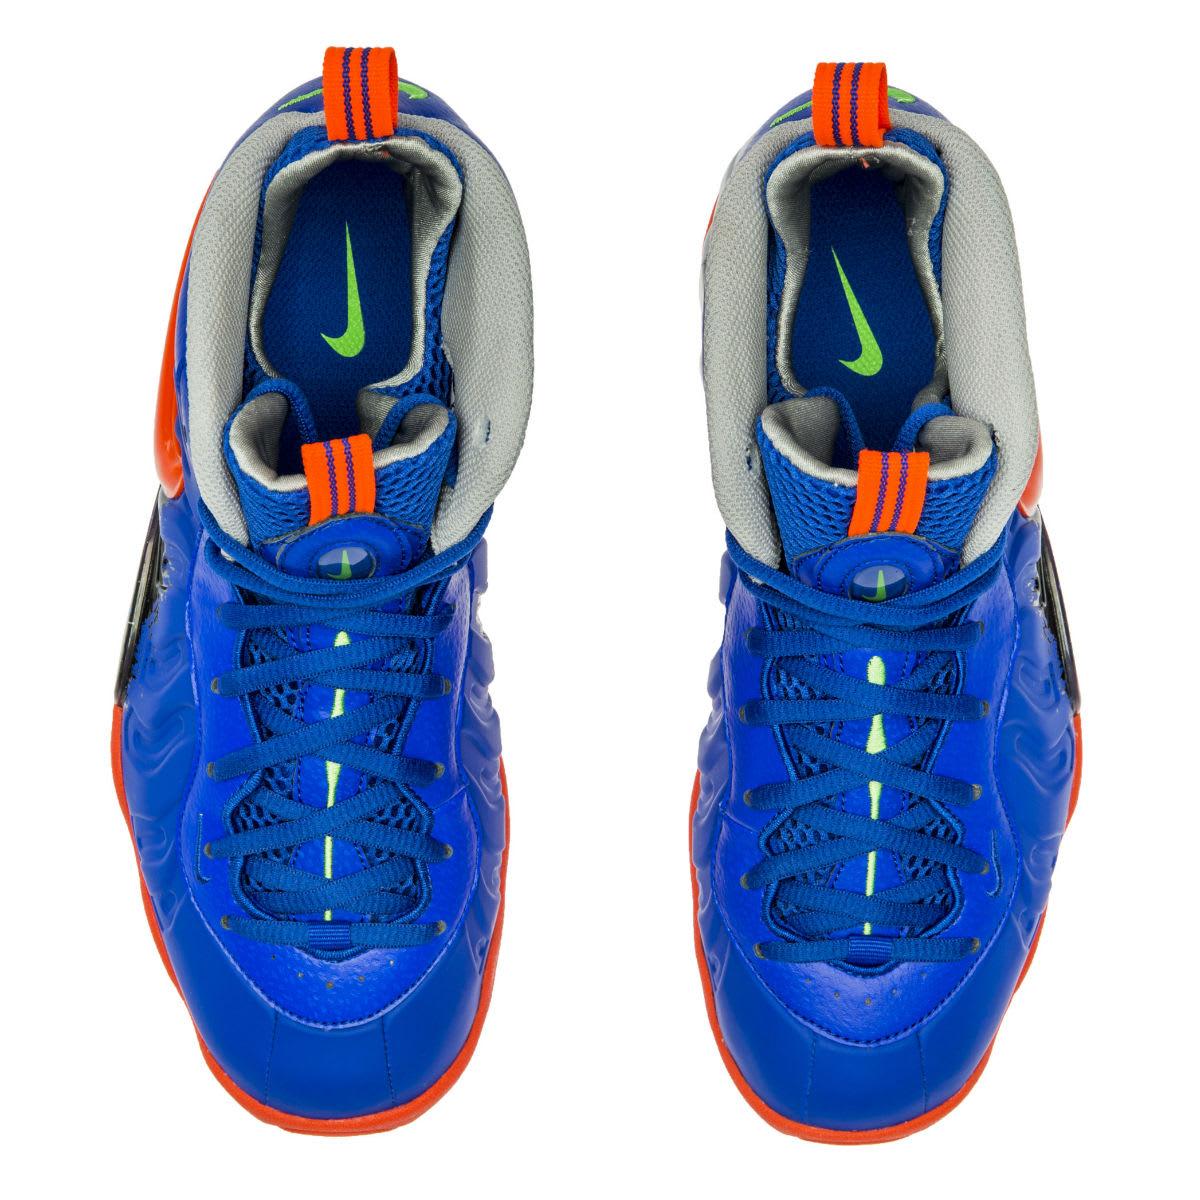 Nike Little Posite Pro Nerf Release Date Top 644792-403